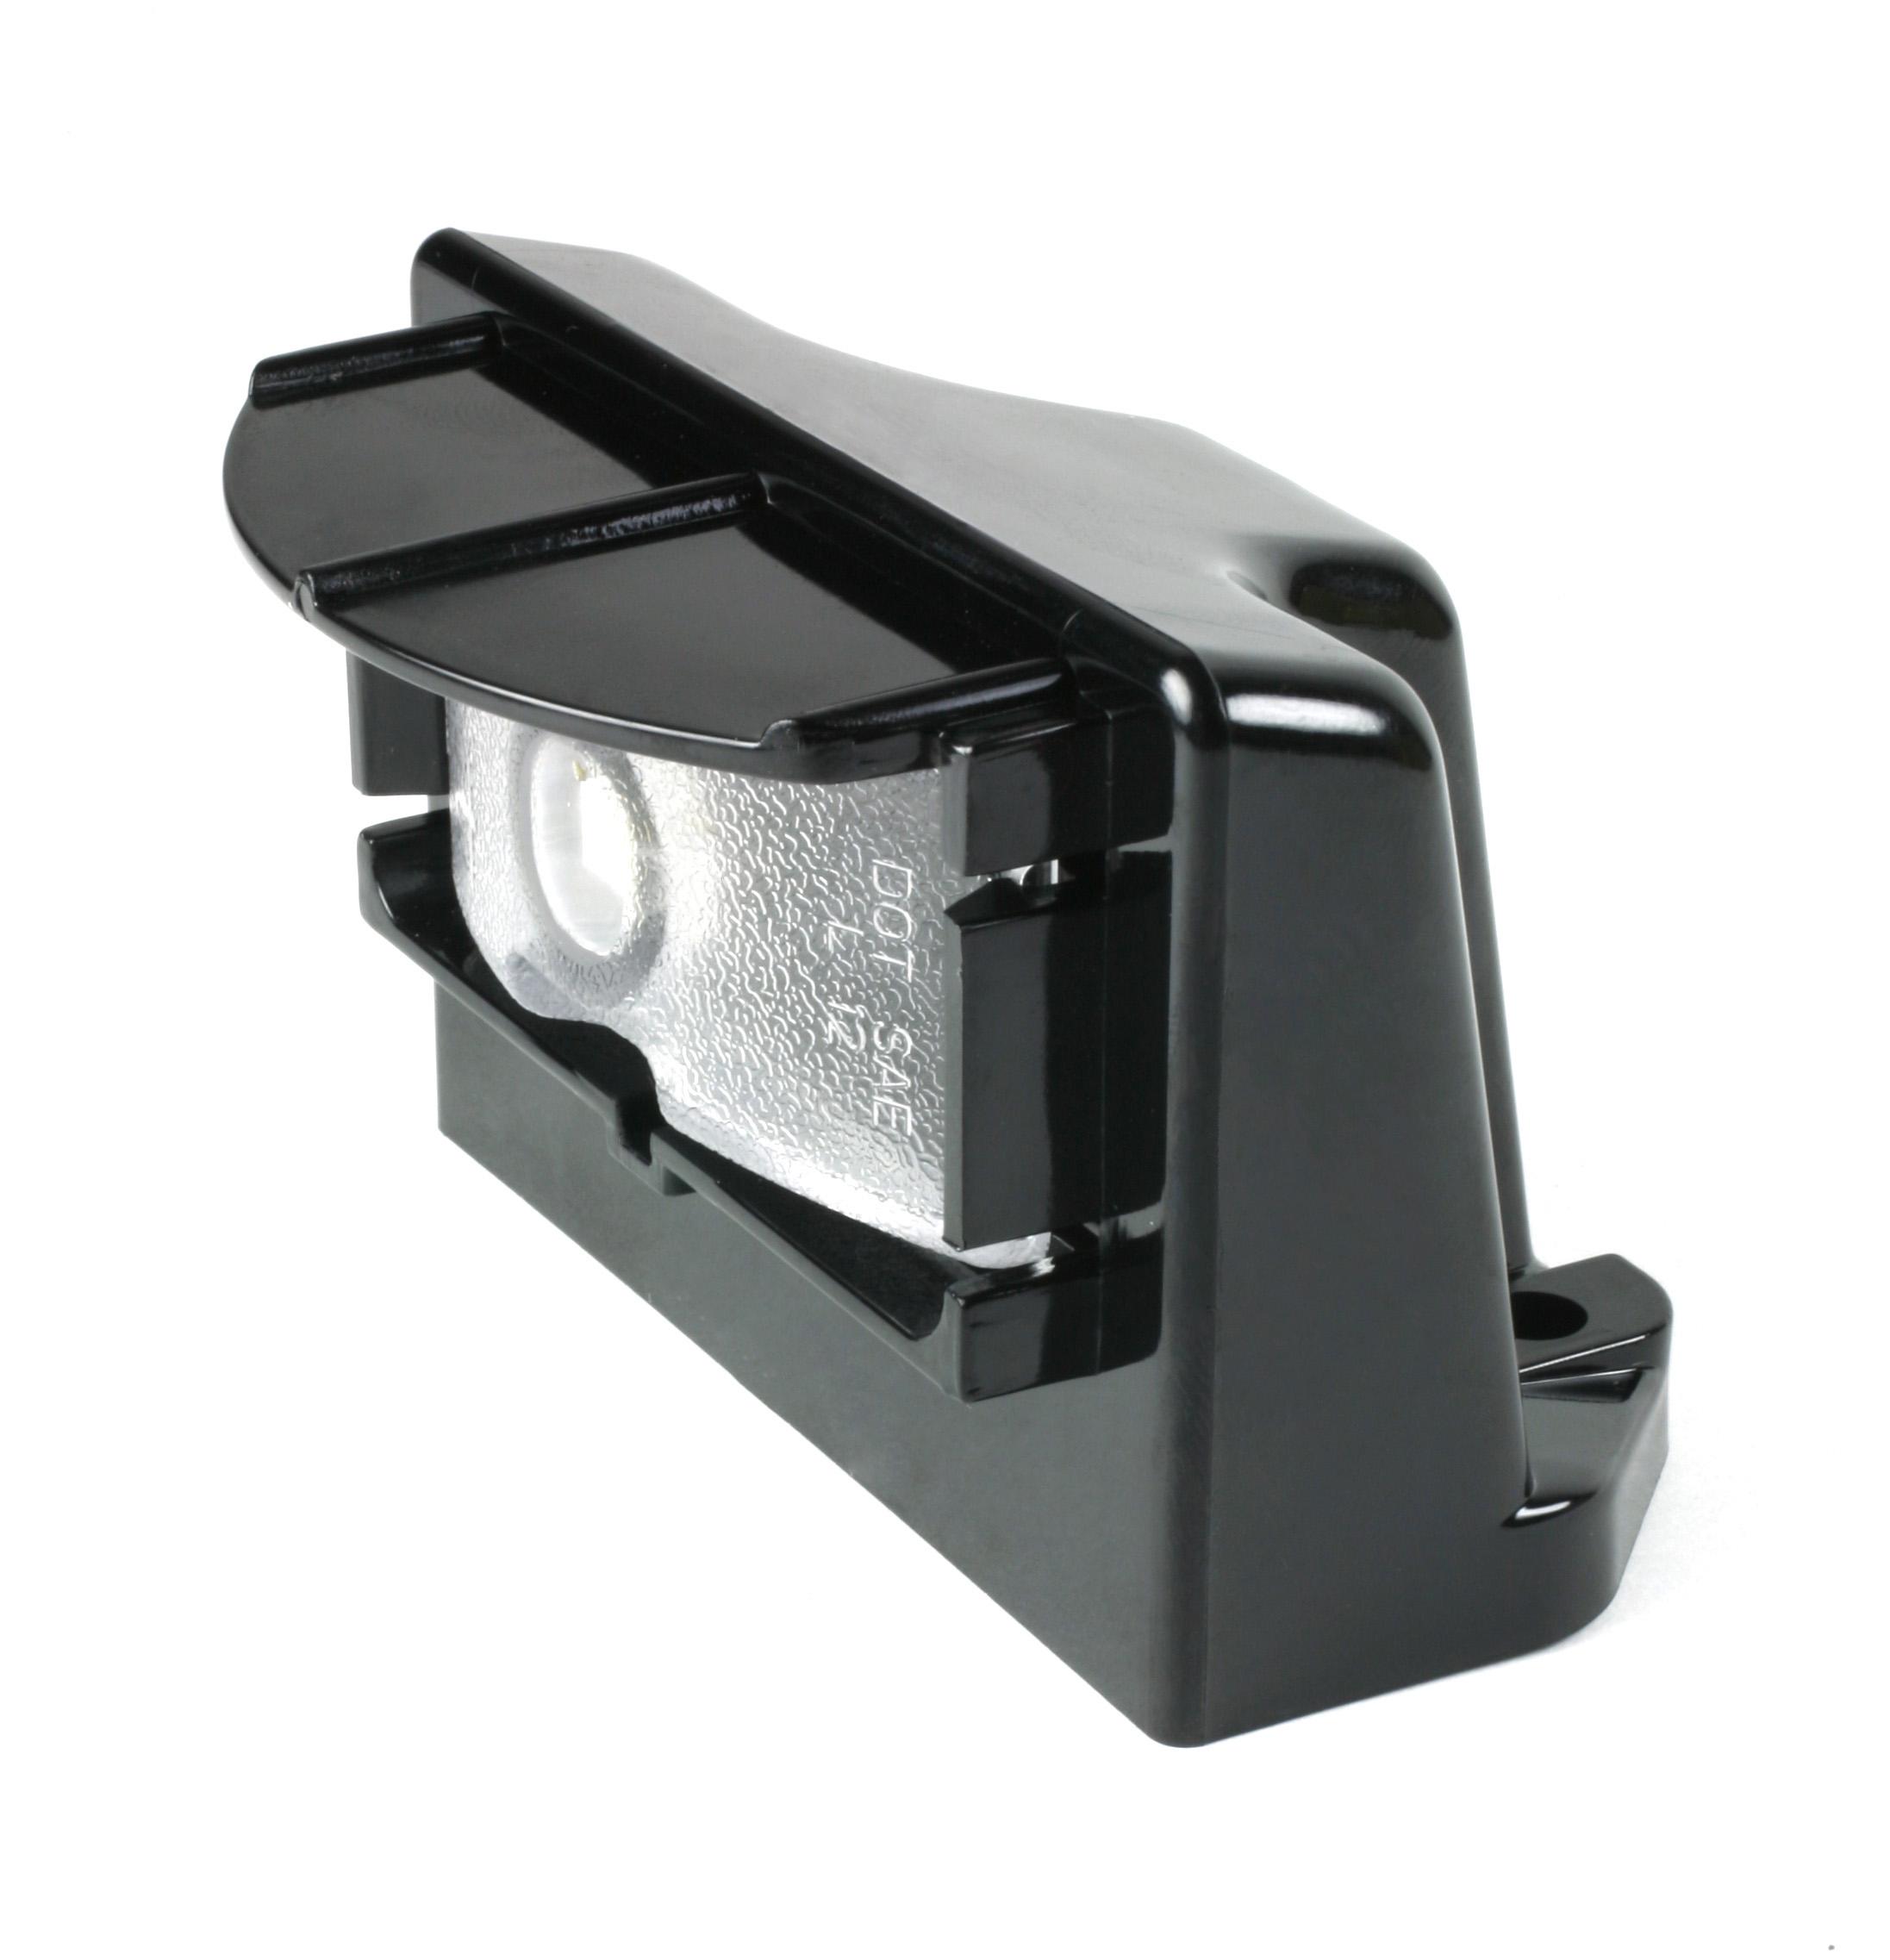 Grote Industries - 60701 – MicroNova® LED License Light, Vertical Mount, Multi-Volt, Black